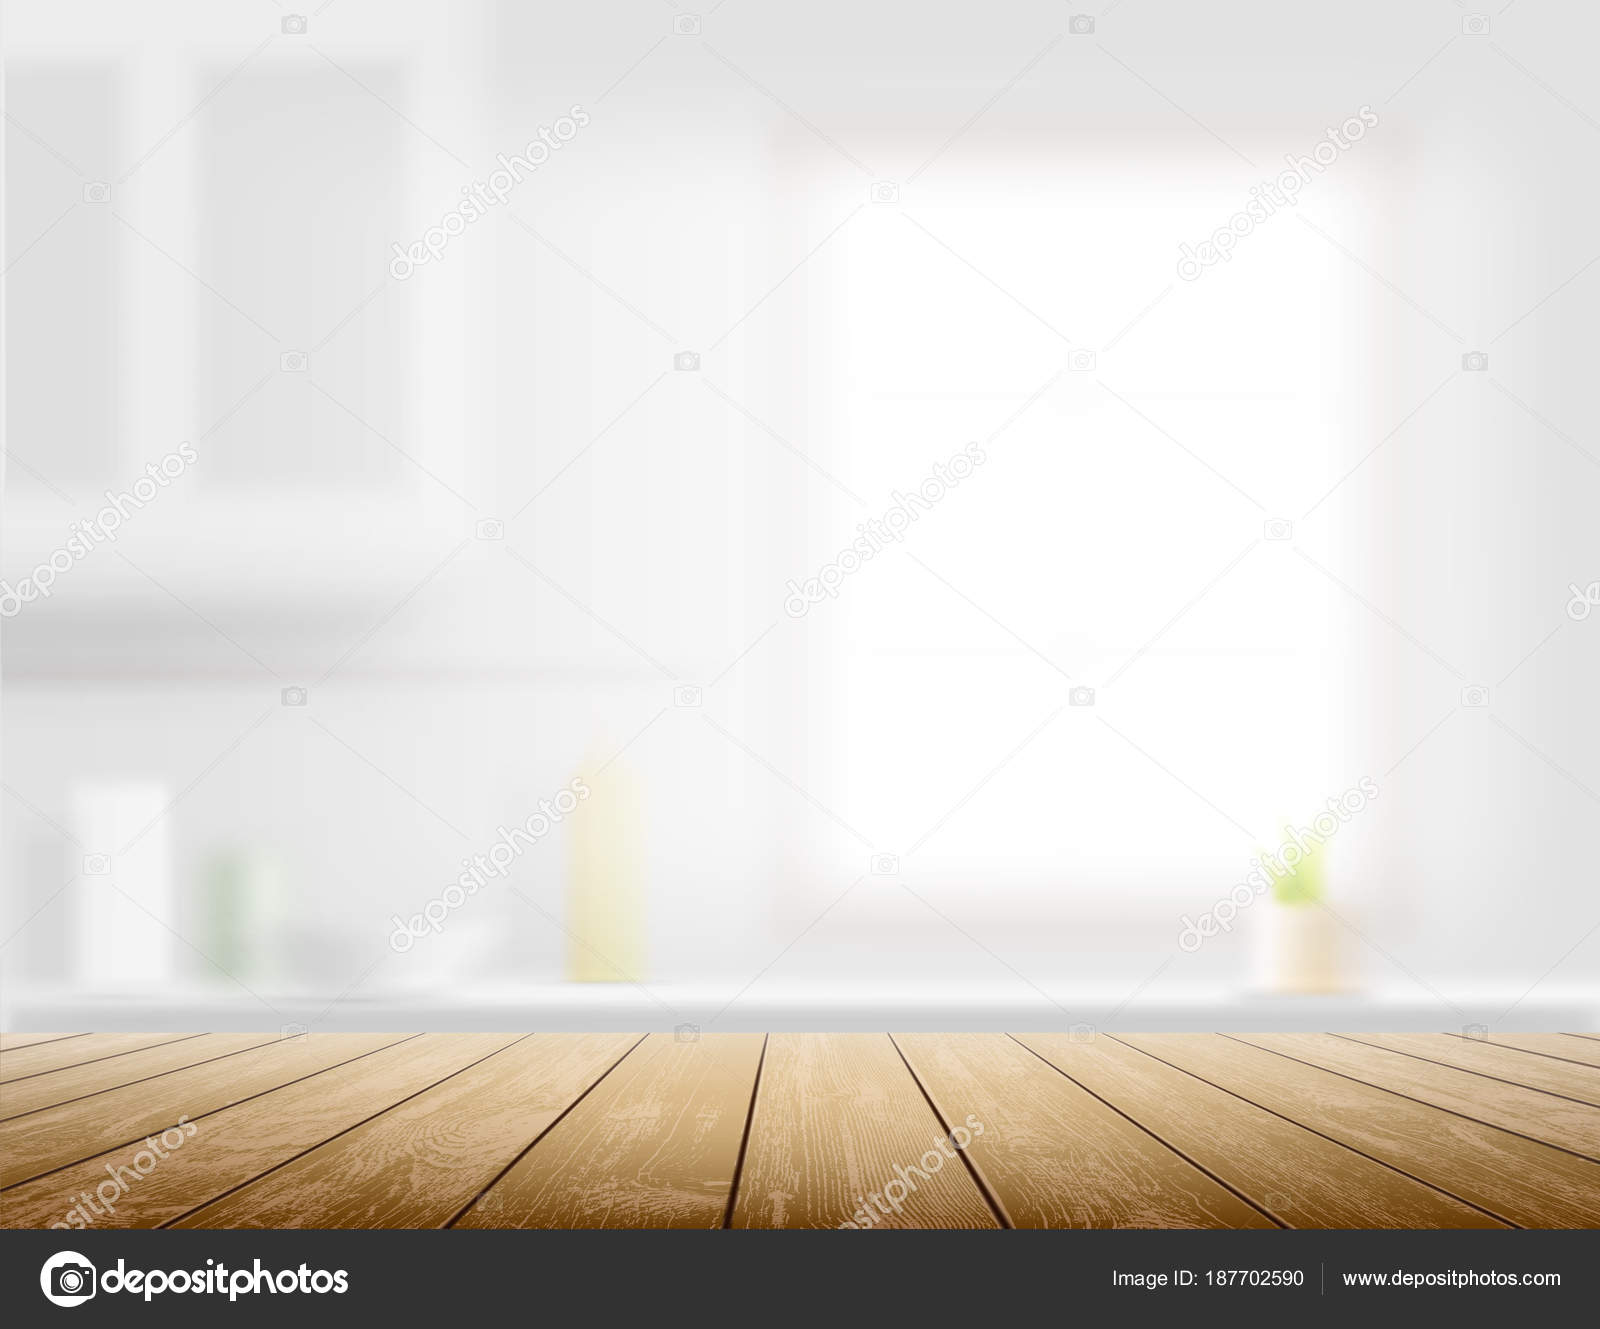 kitchen benches window treatments for 木桌上的弥散厨房长椅内部背景股票矢量图 图库矢量图像 c vantuz 187702590 图库矢量